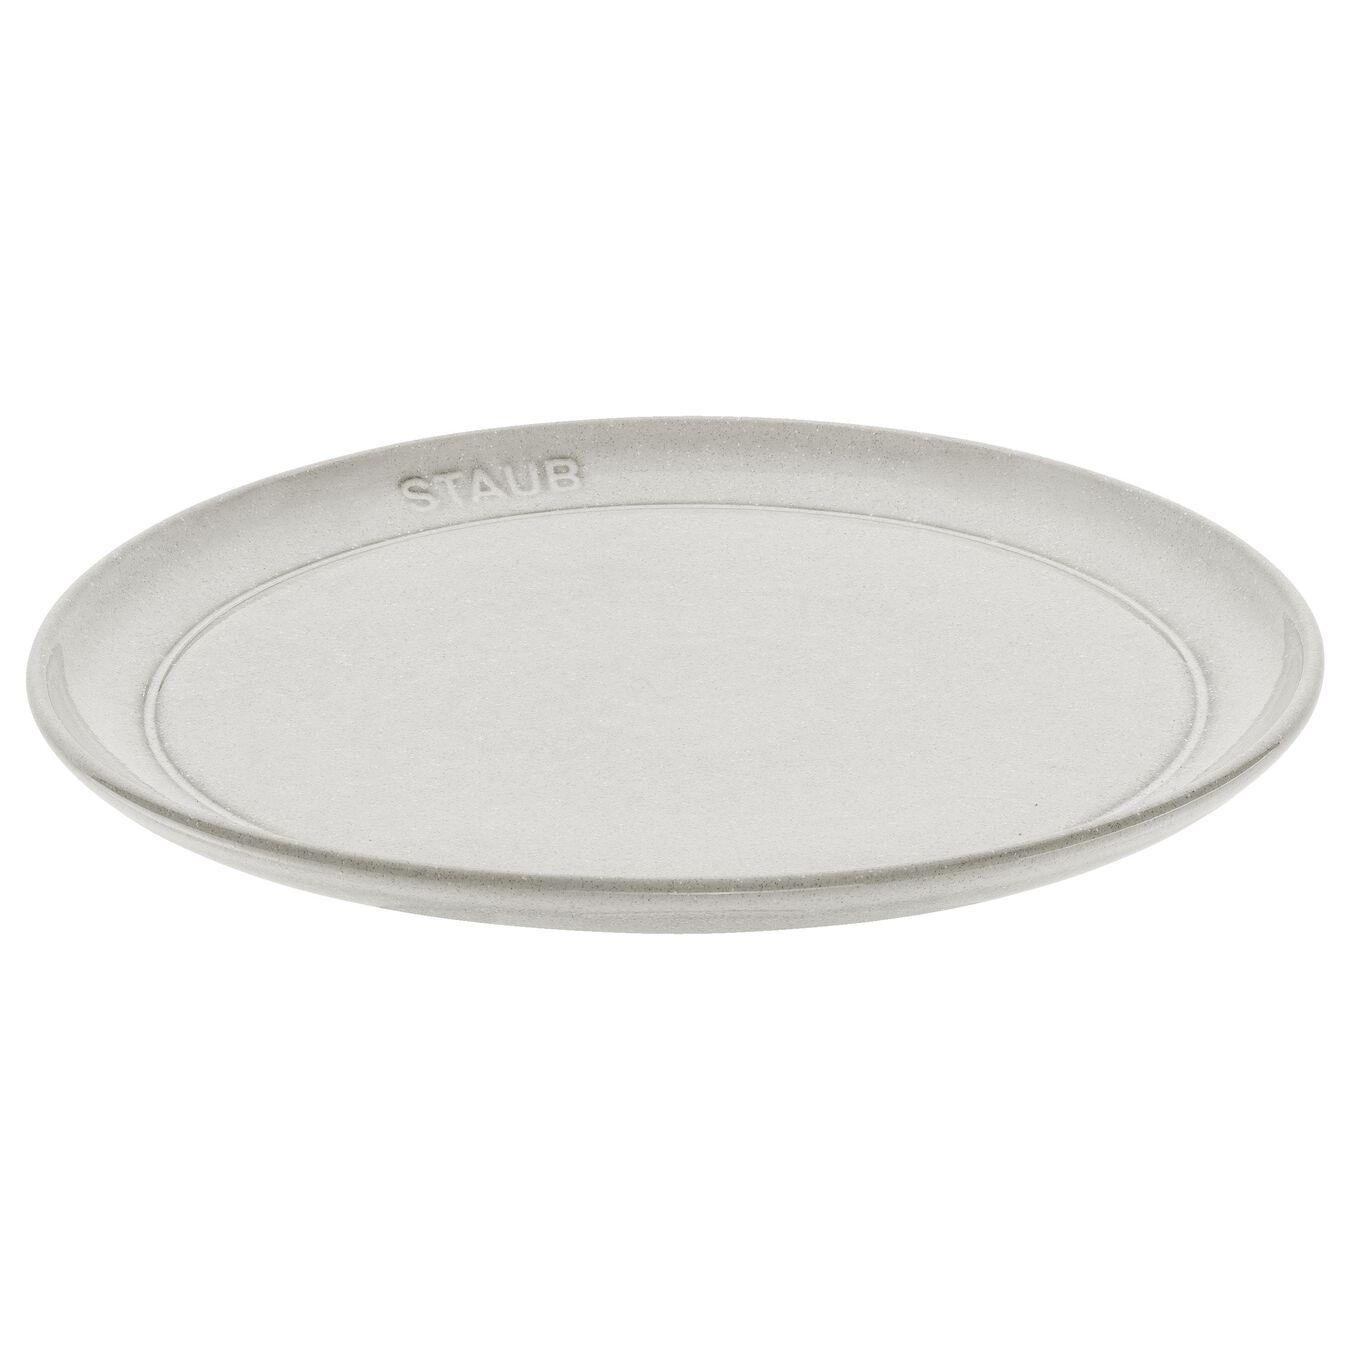 Serving set, 48 Piece | white truffle | ceramic,,large 4